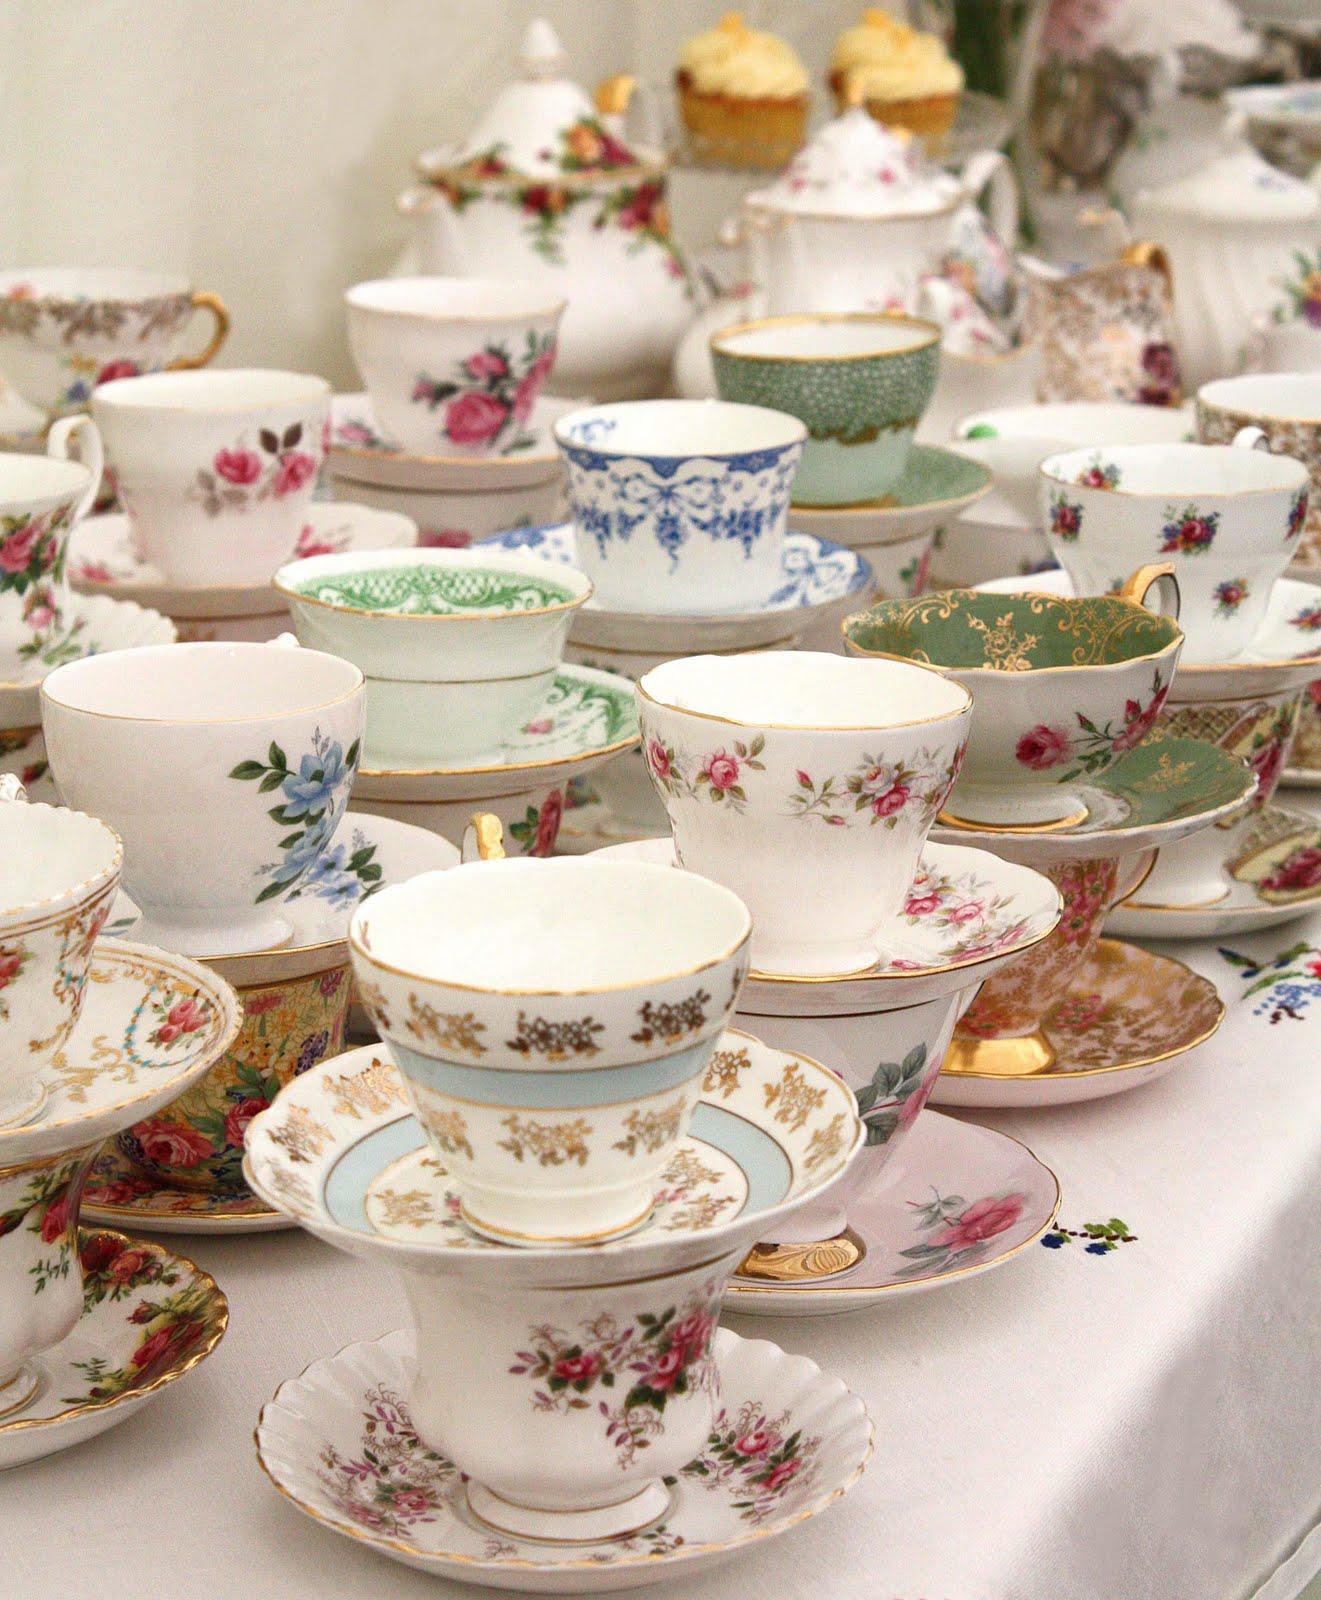 Wedding Flowers Lancashire: Lancashire Bride: A Taste Of Lancashire: My Fair Vintage